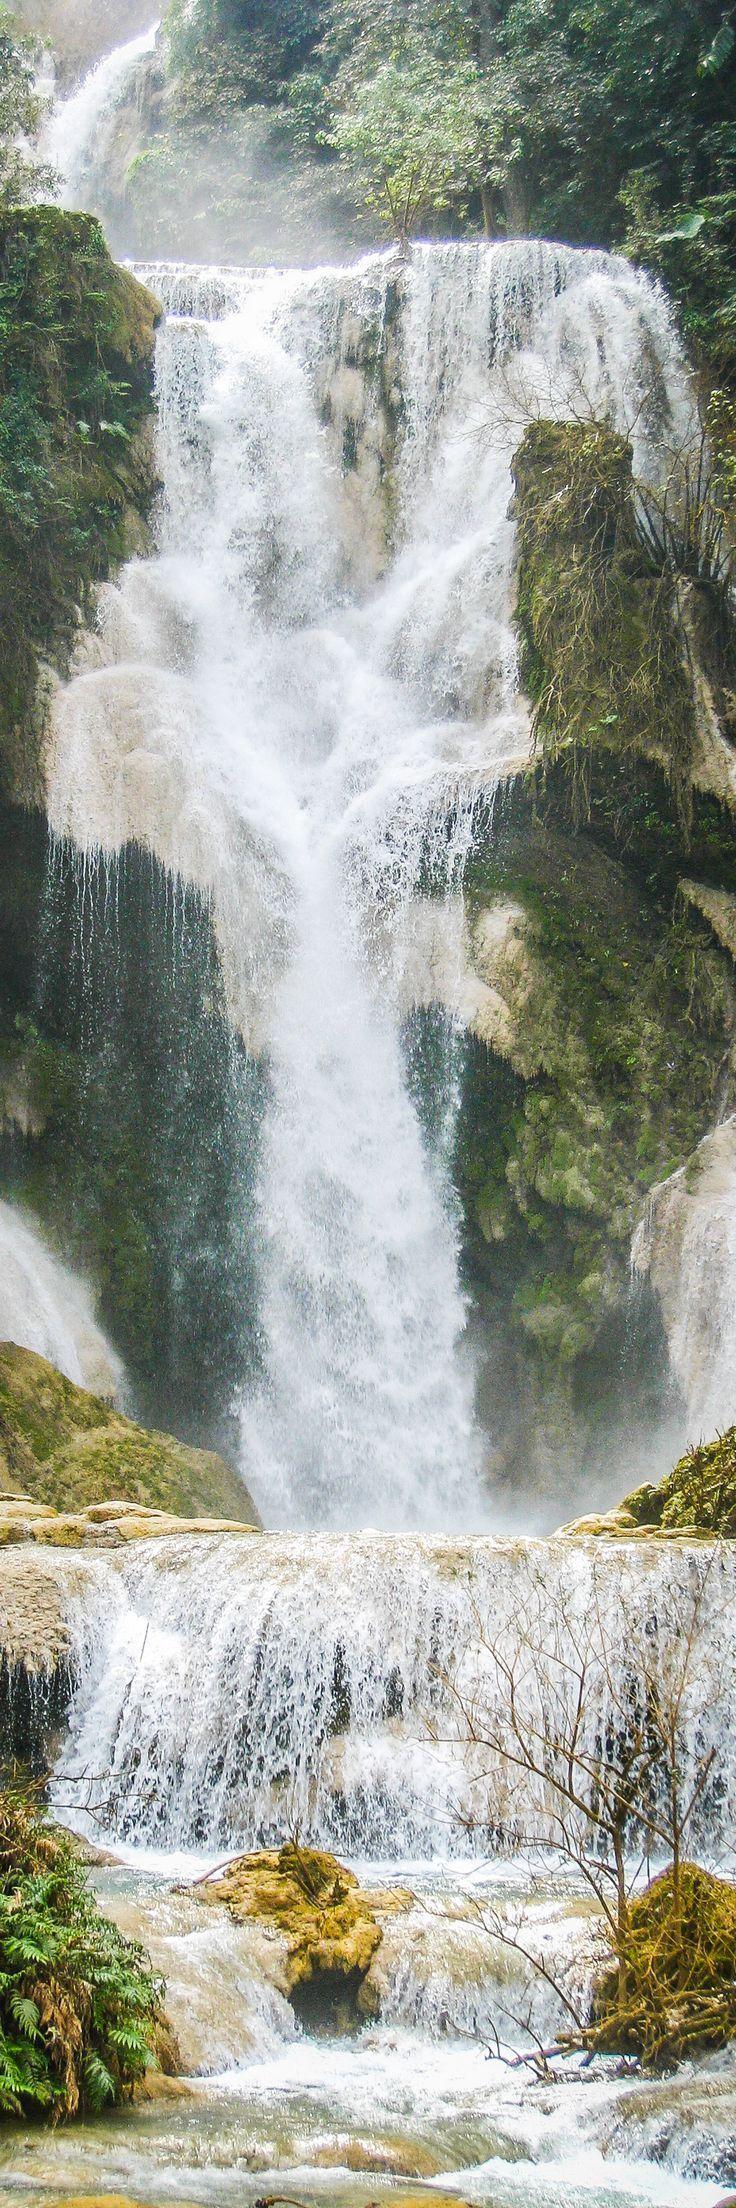 Kuang Si Falls, luaLuang Prabang